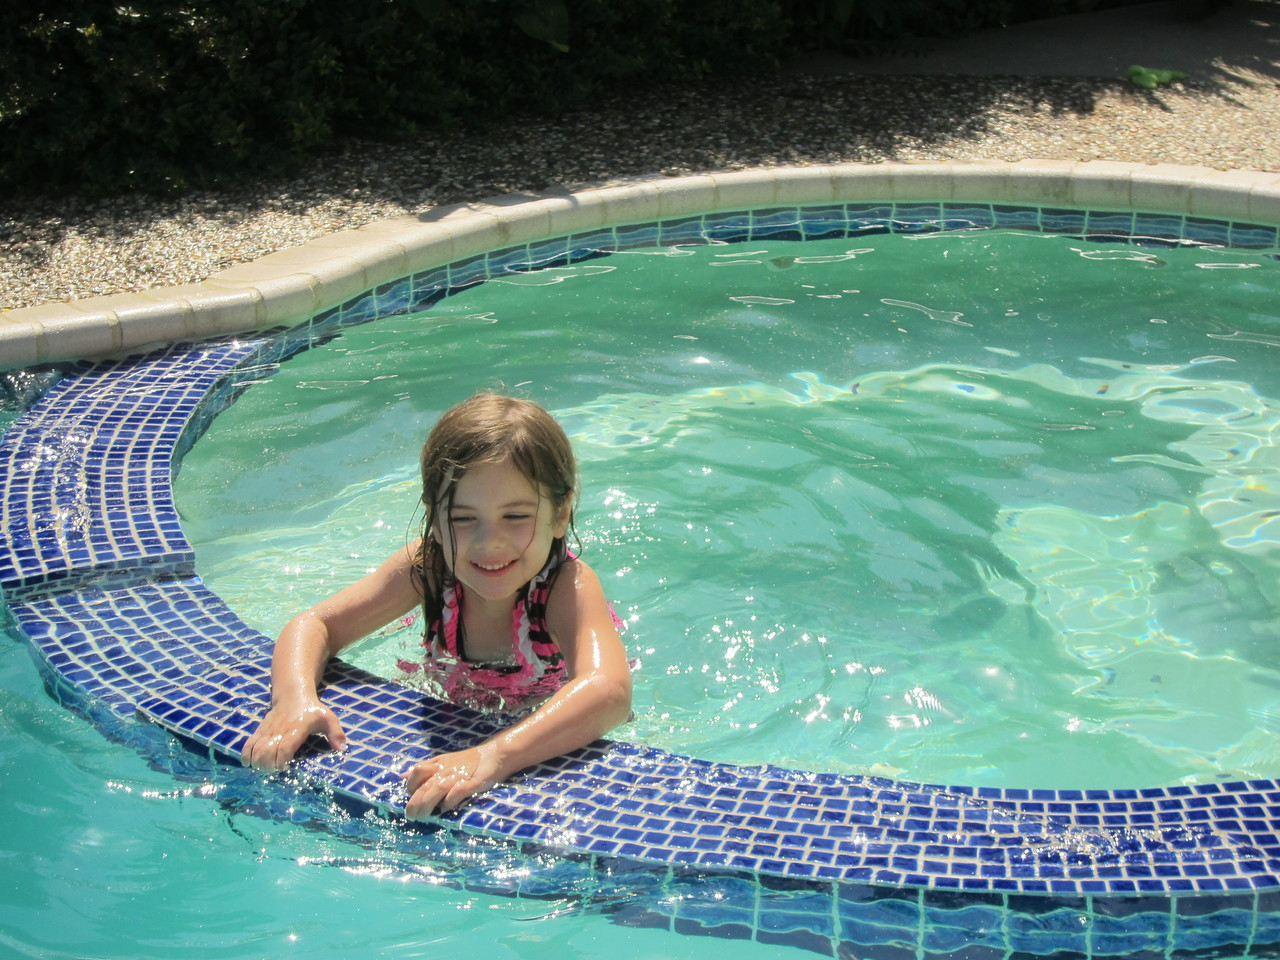 Etta enjoys the (cool) hot tub